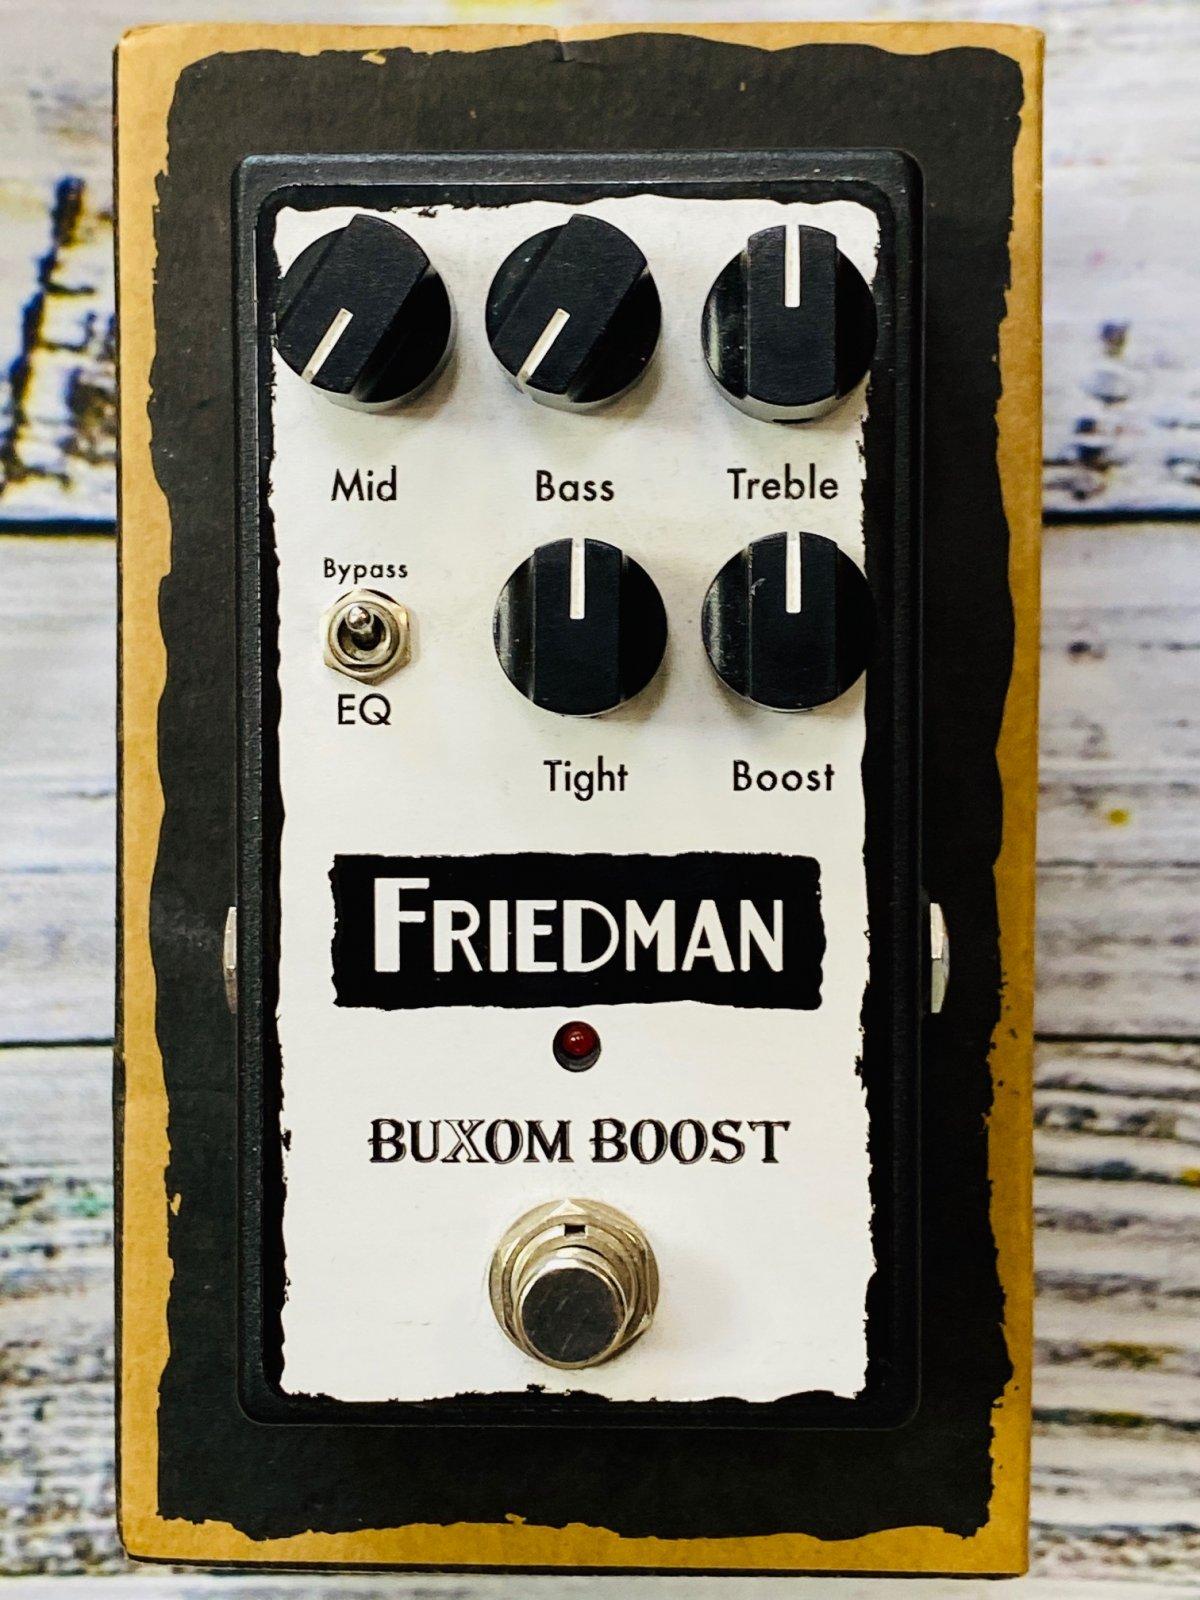 Friedman Buxom Boost Pedal